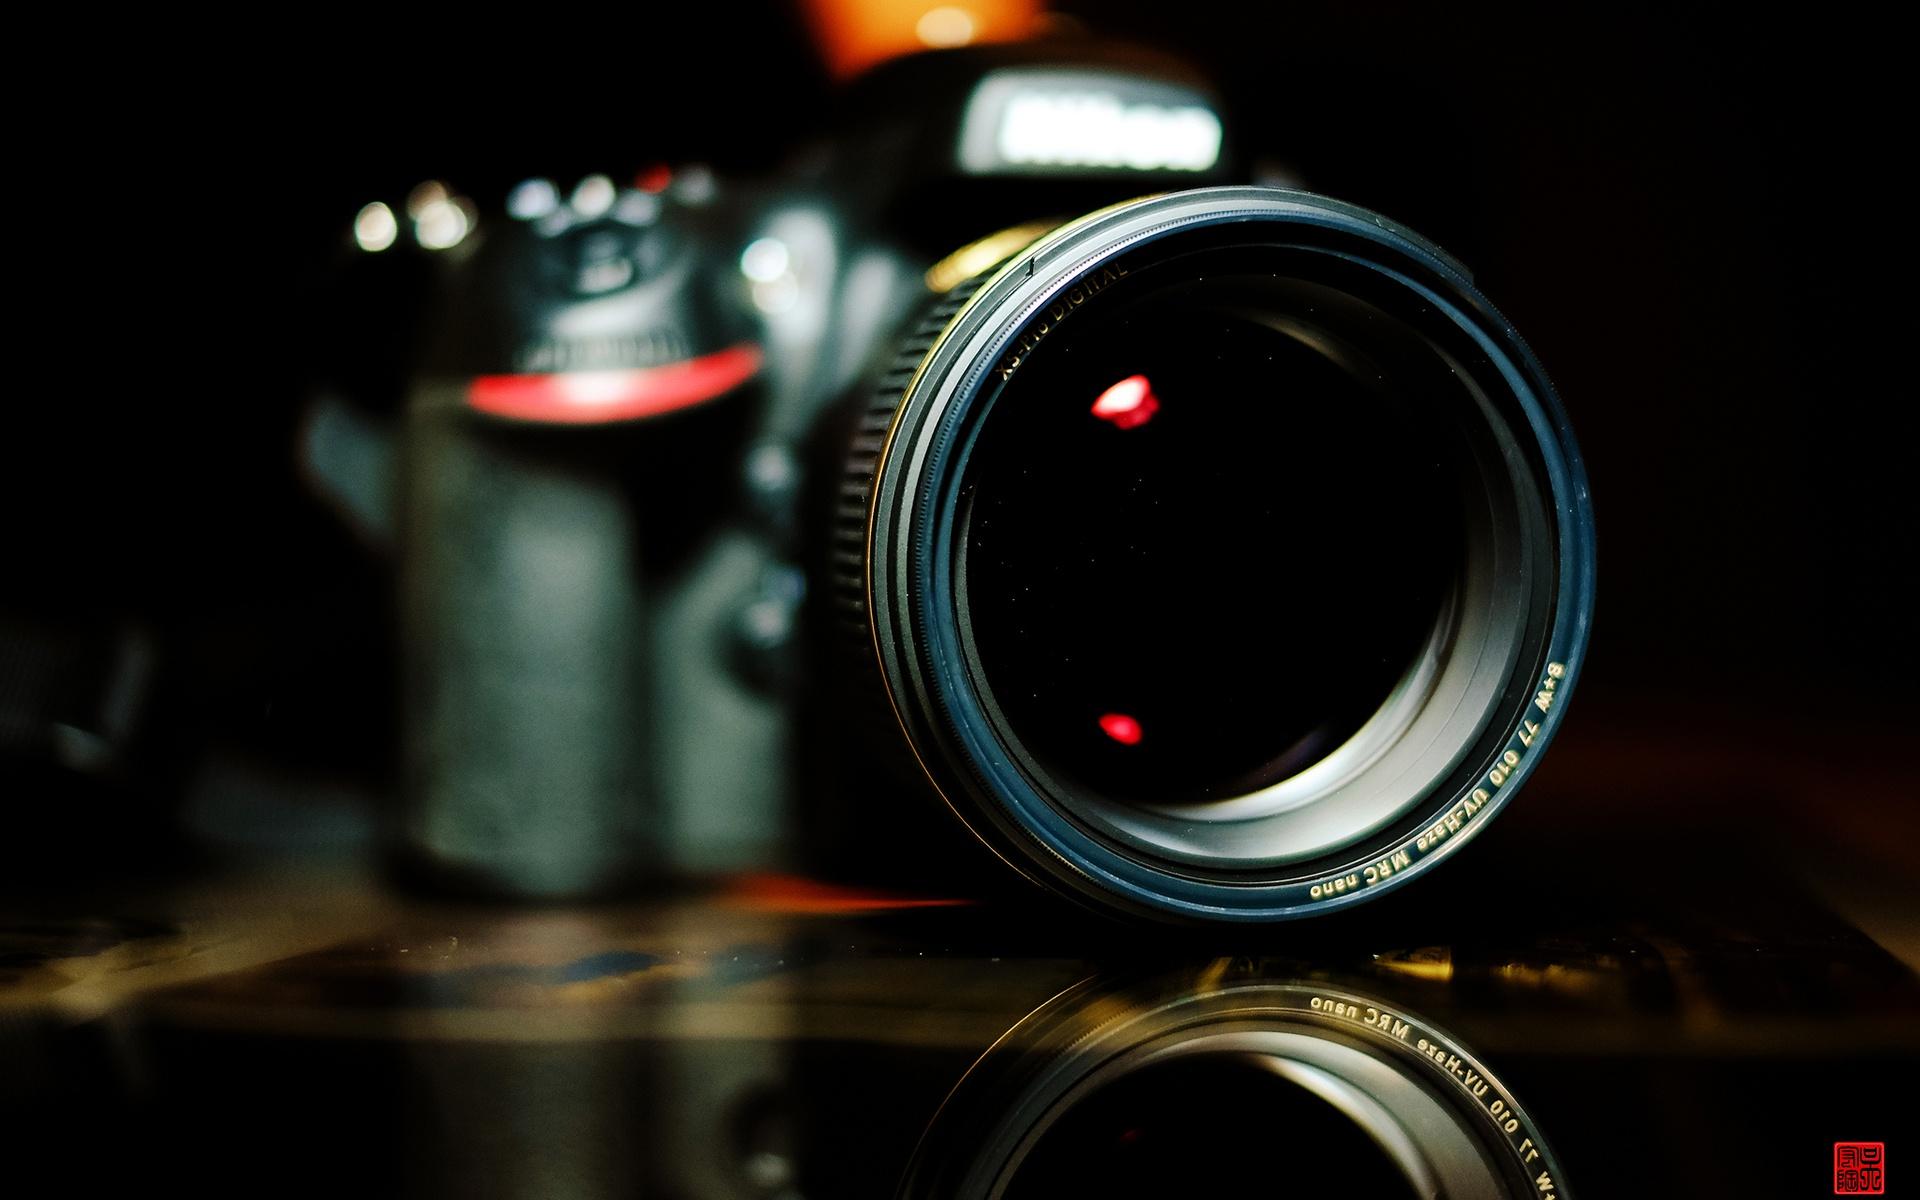 Lens fotografia y video 74